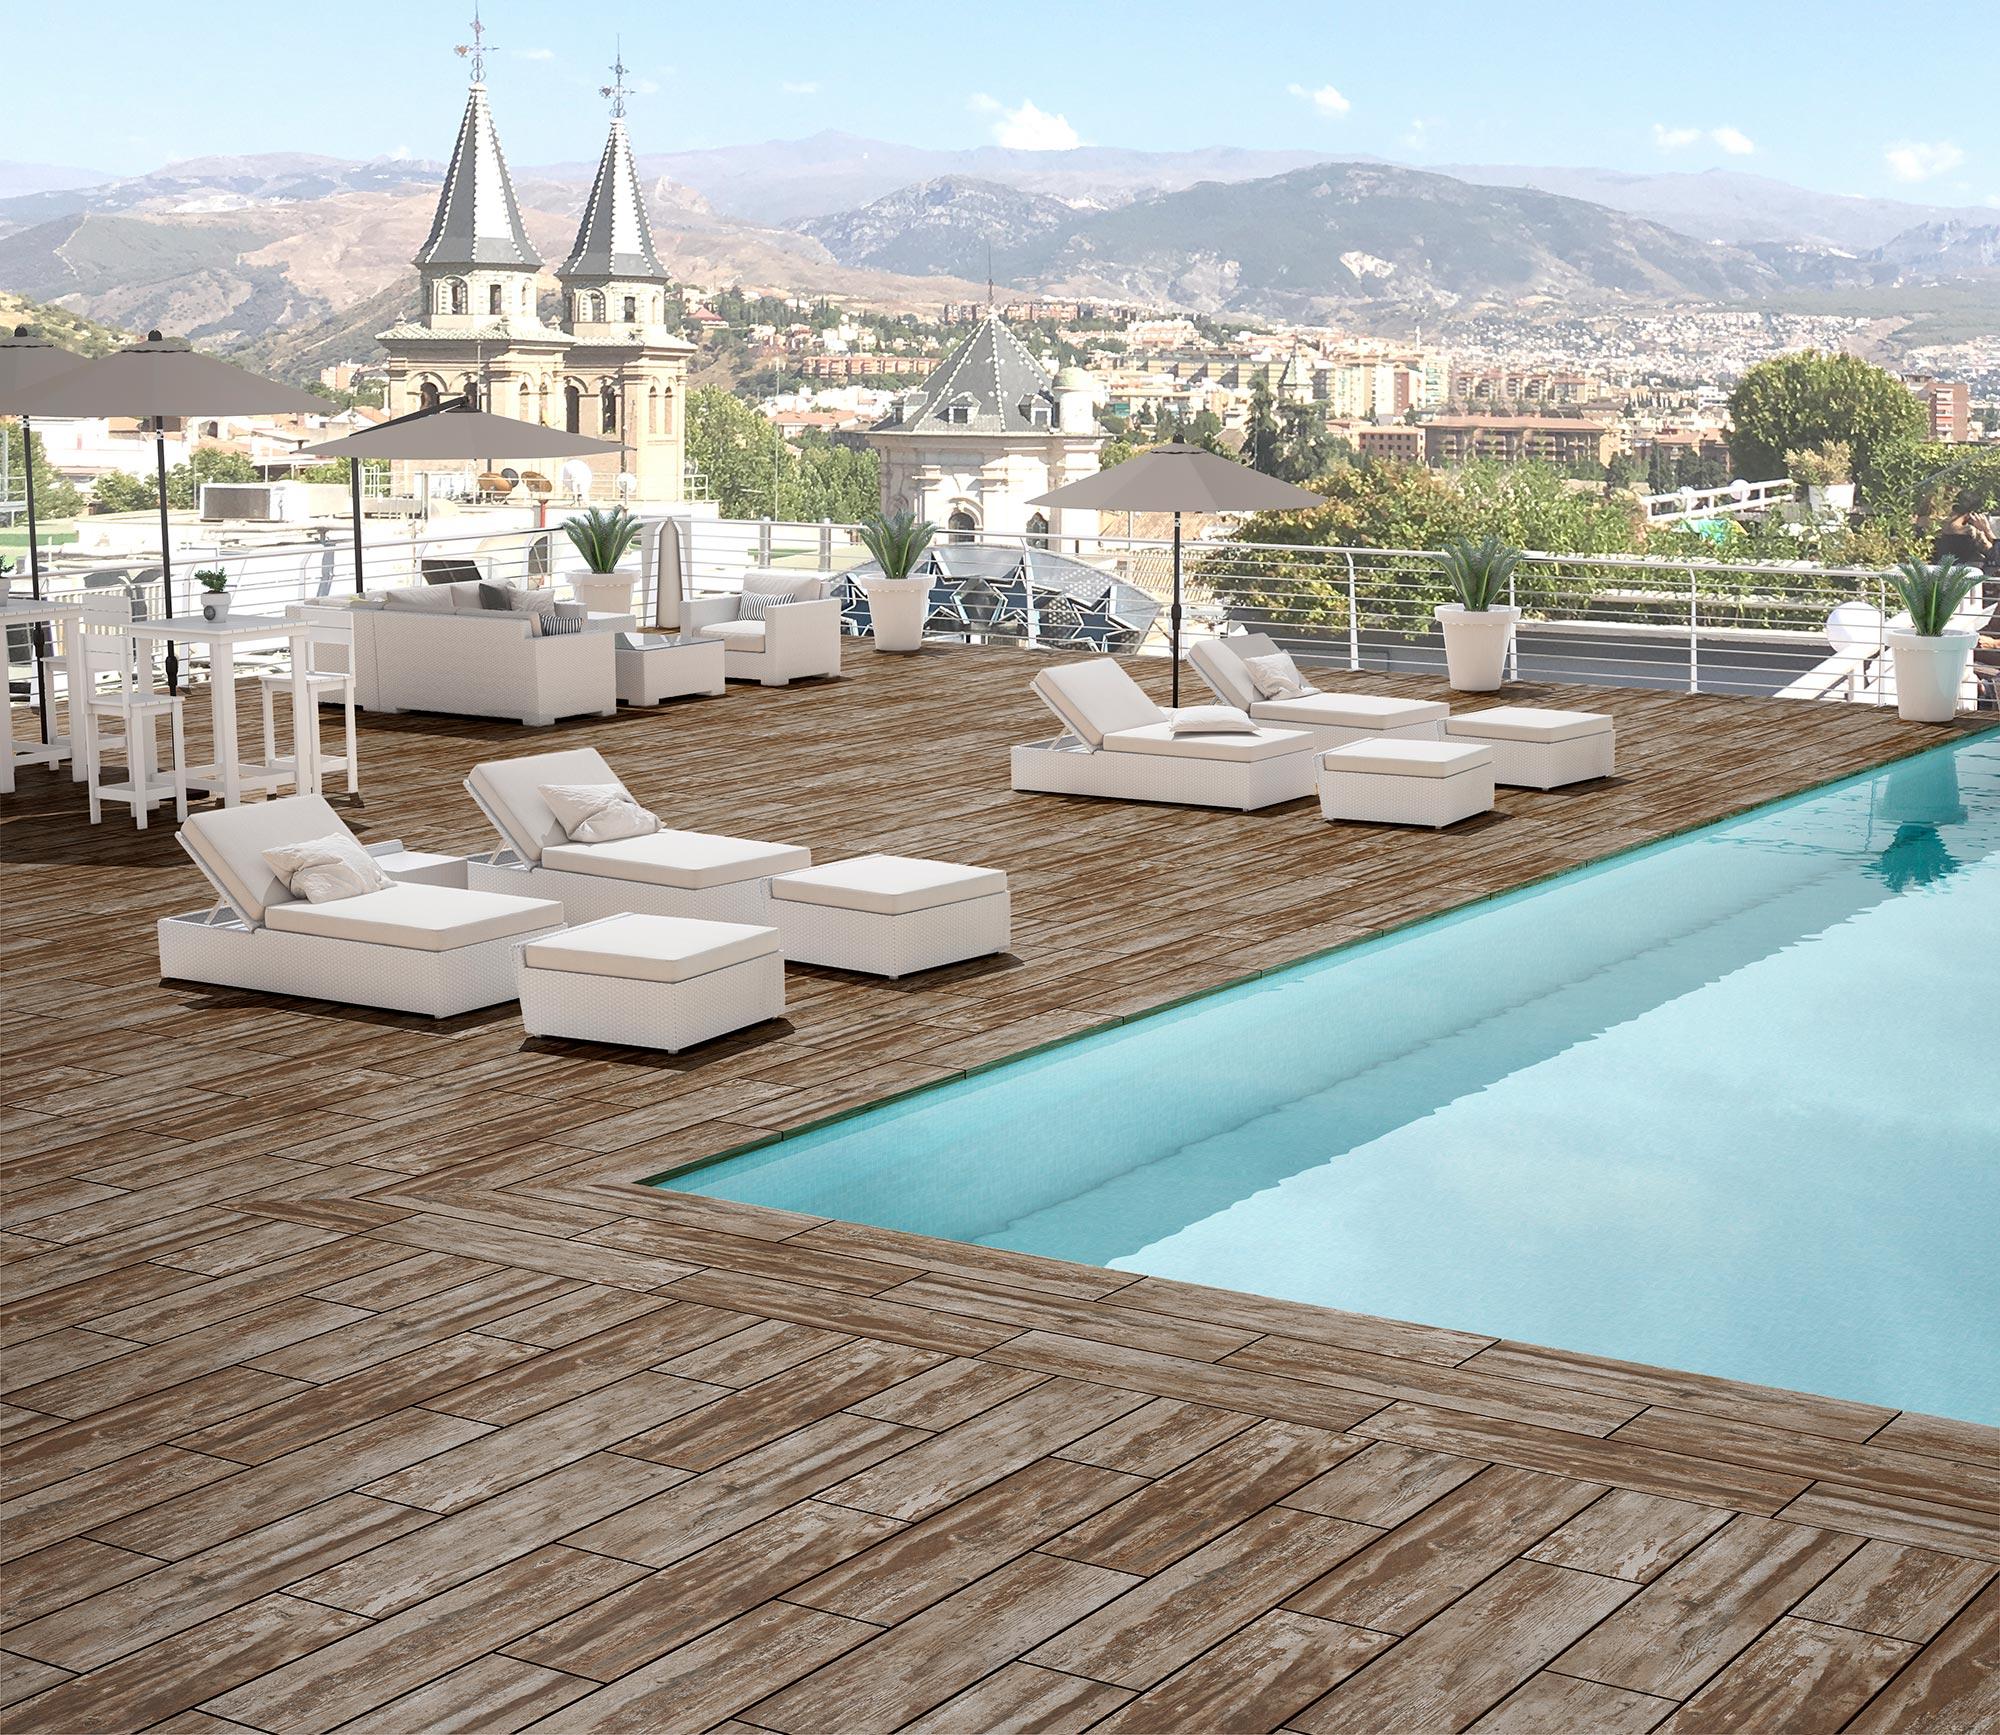 piscina en azotea de hotel con pavimento de gres extrusionado